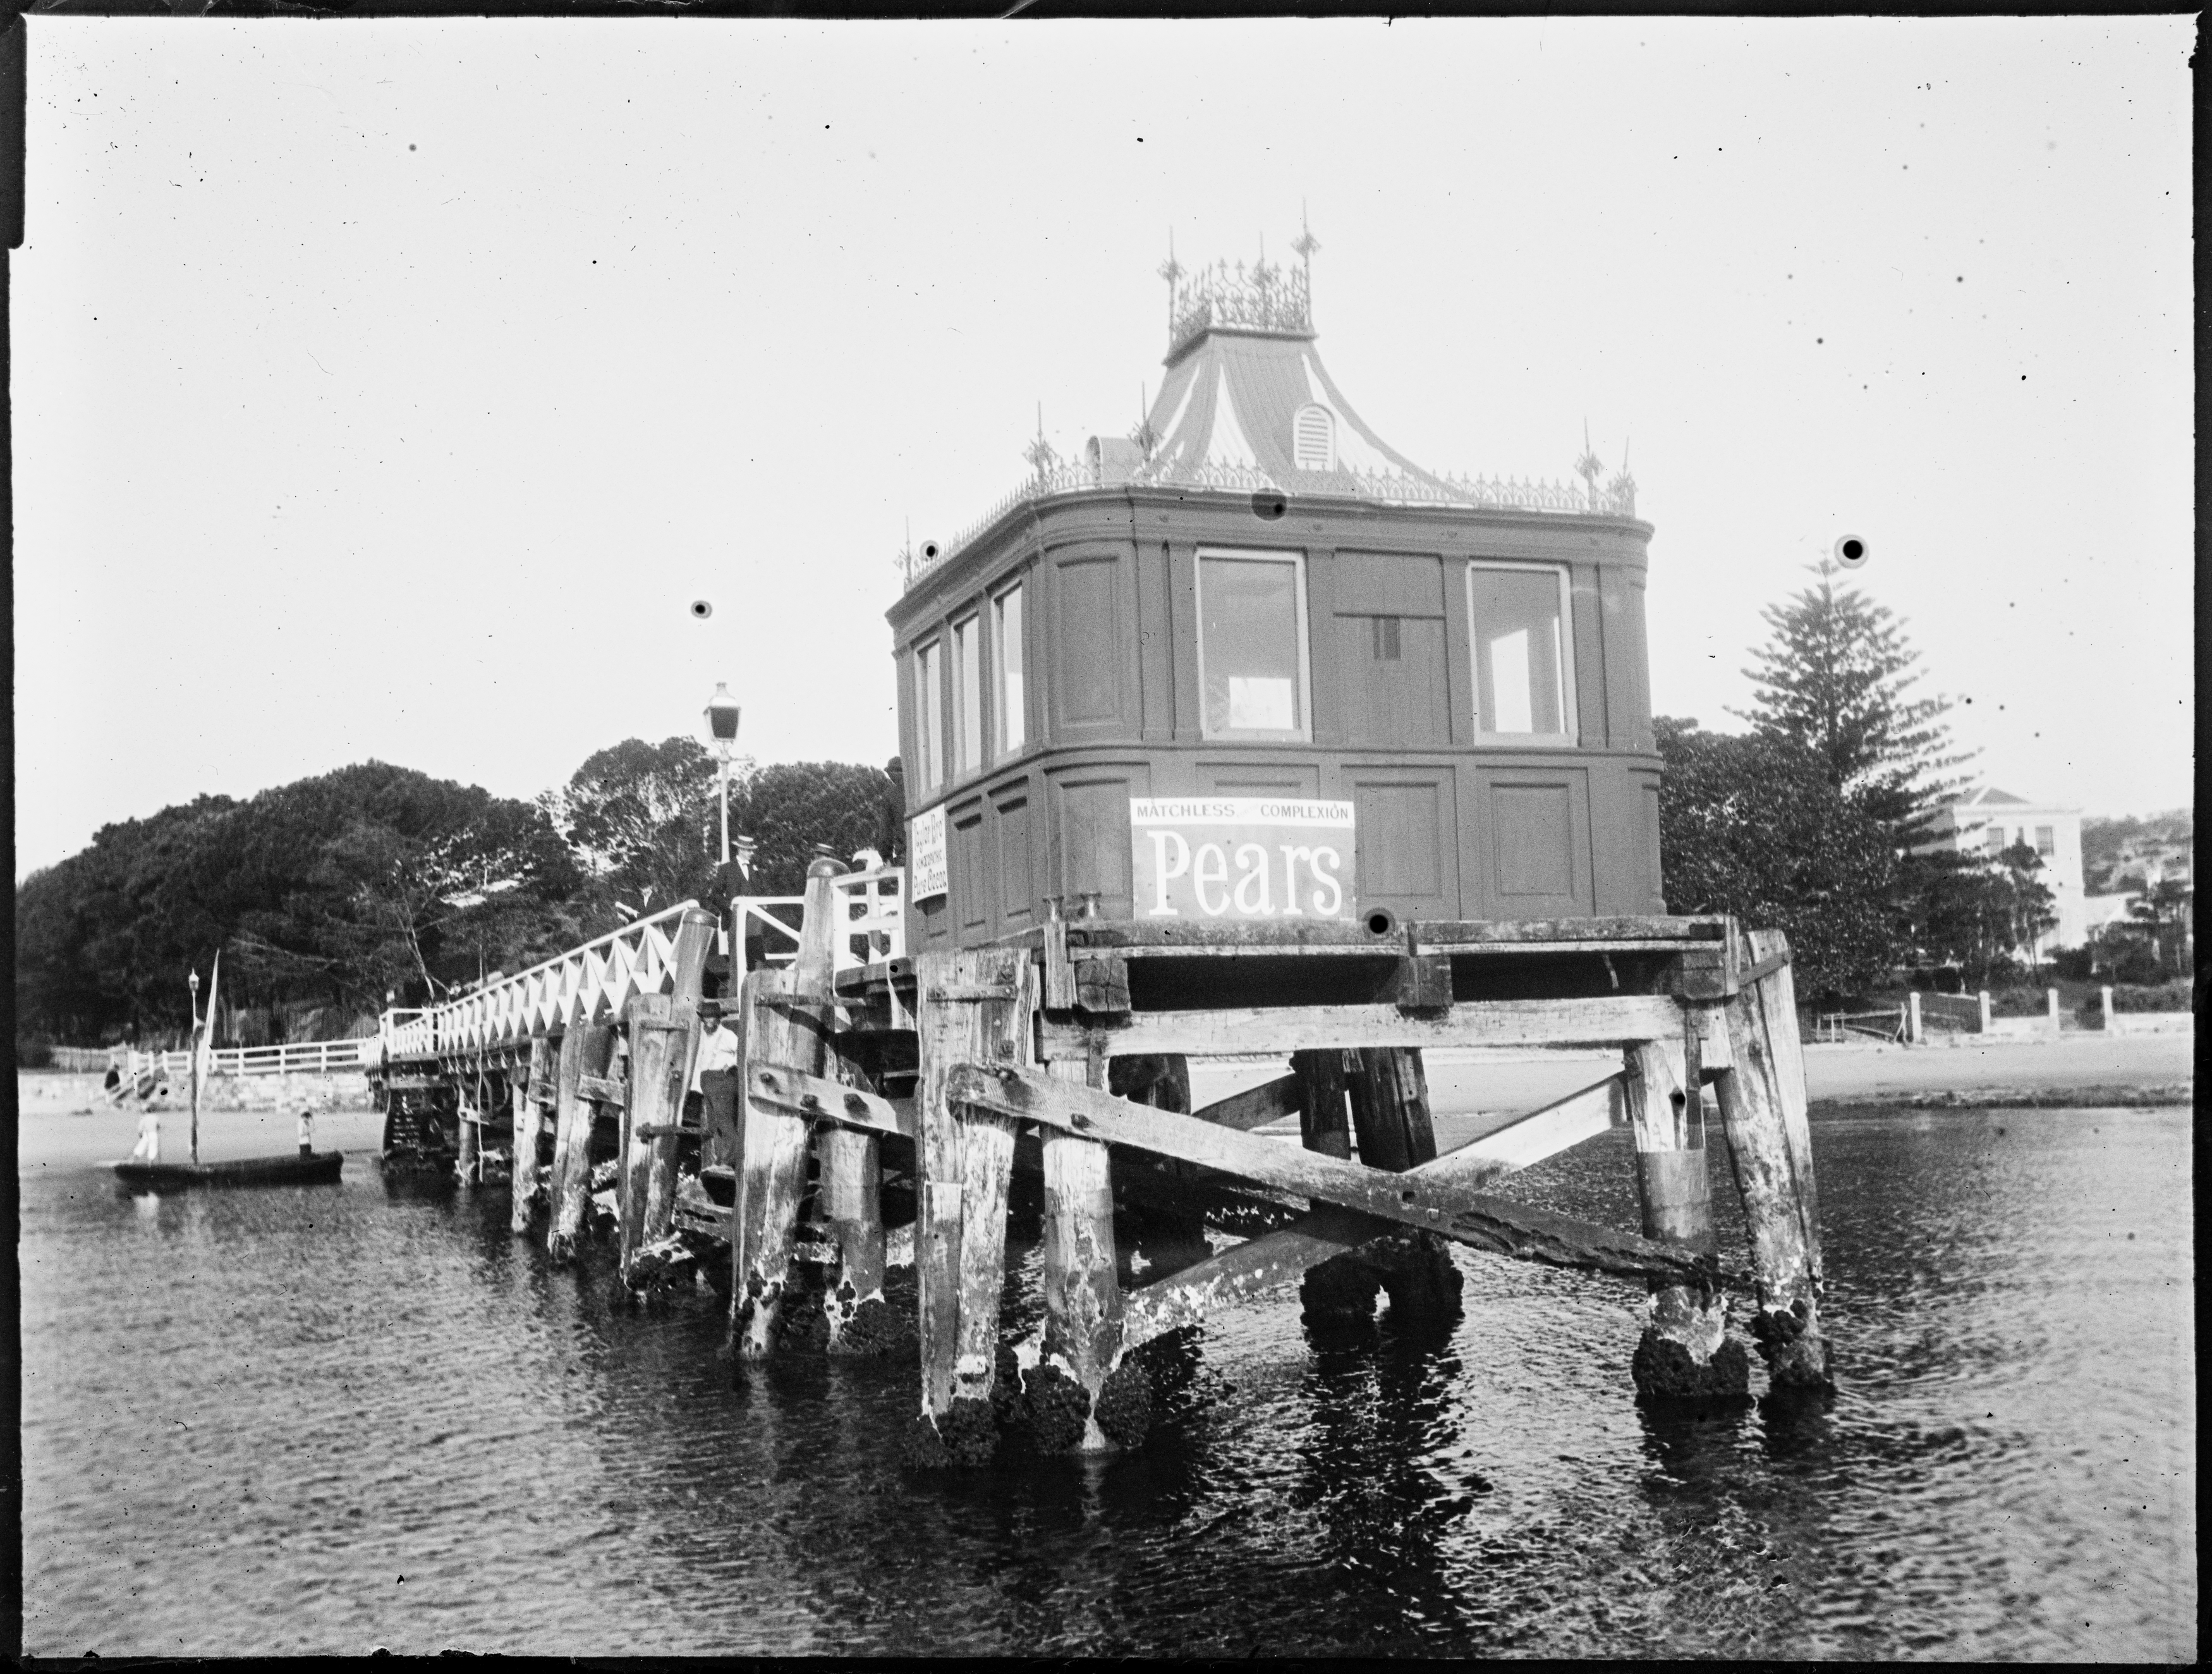 Ferry wharf at Watsons Bay